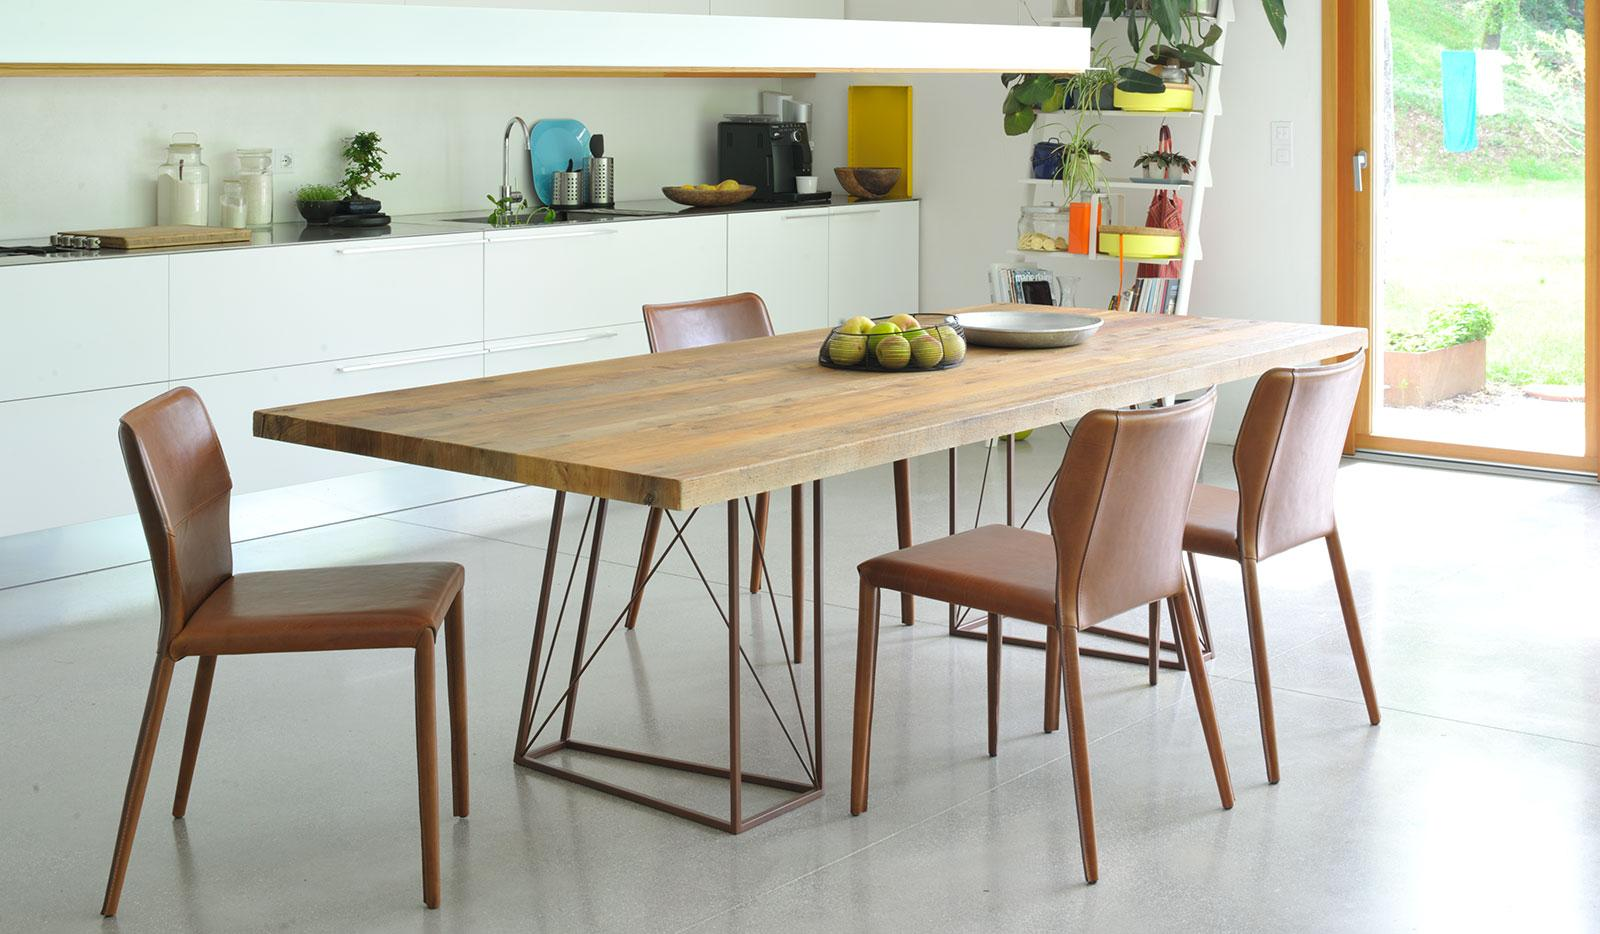 Tavoli in legno design moderno xj06 regardsdefemmes - Ikea tavoli da pranzo ...